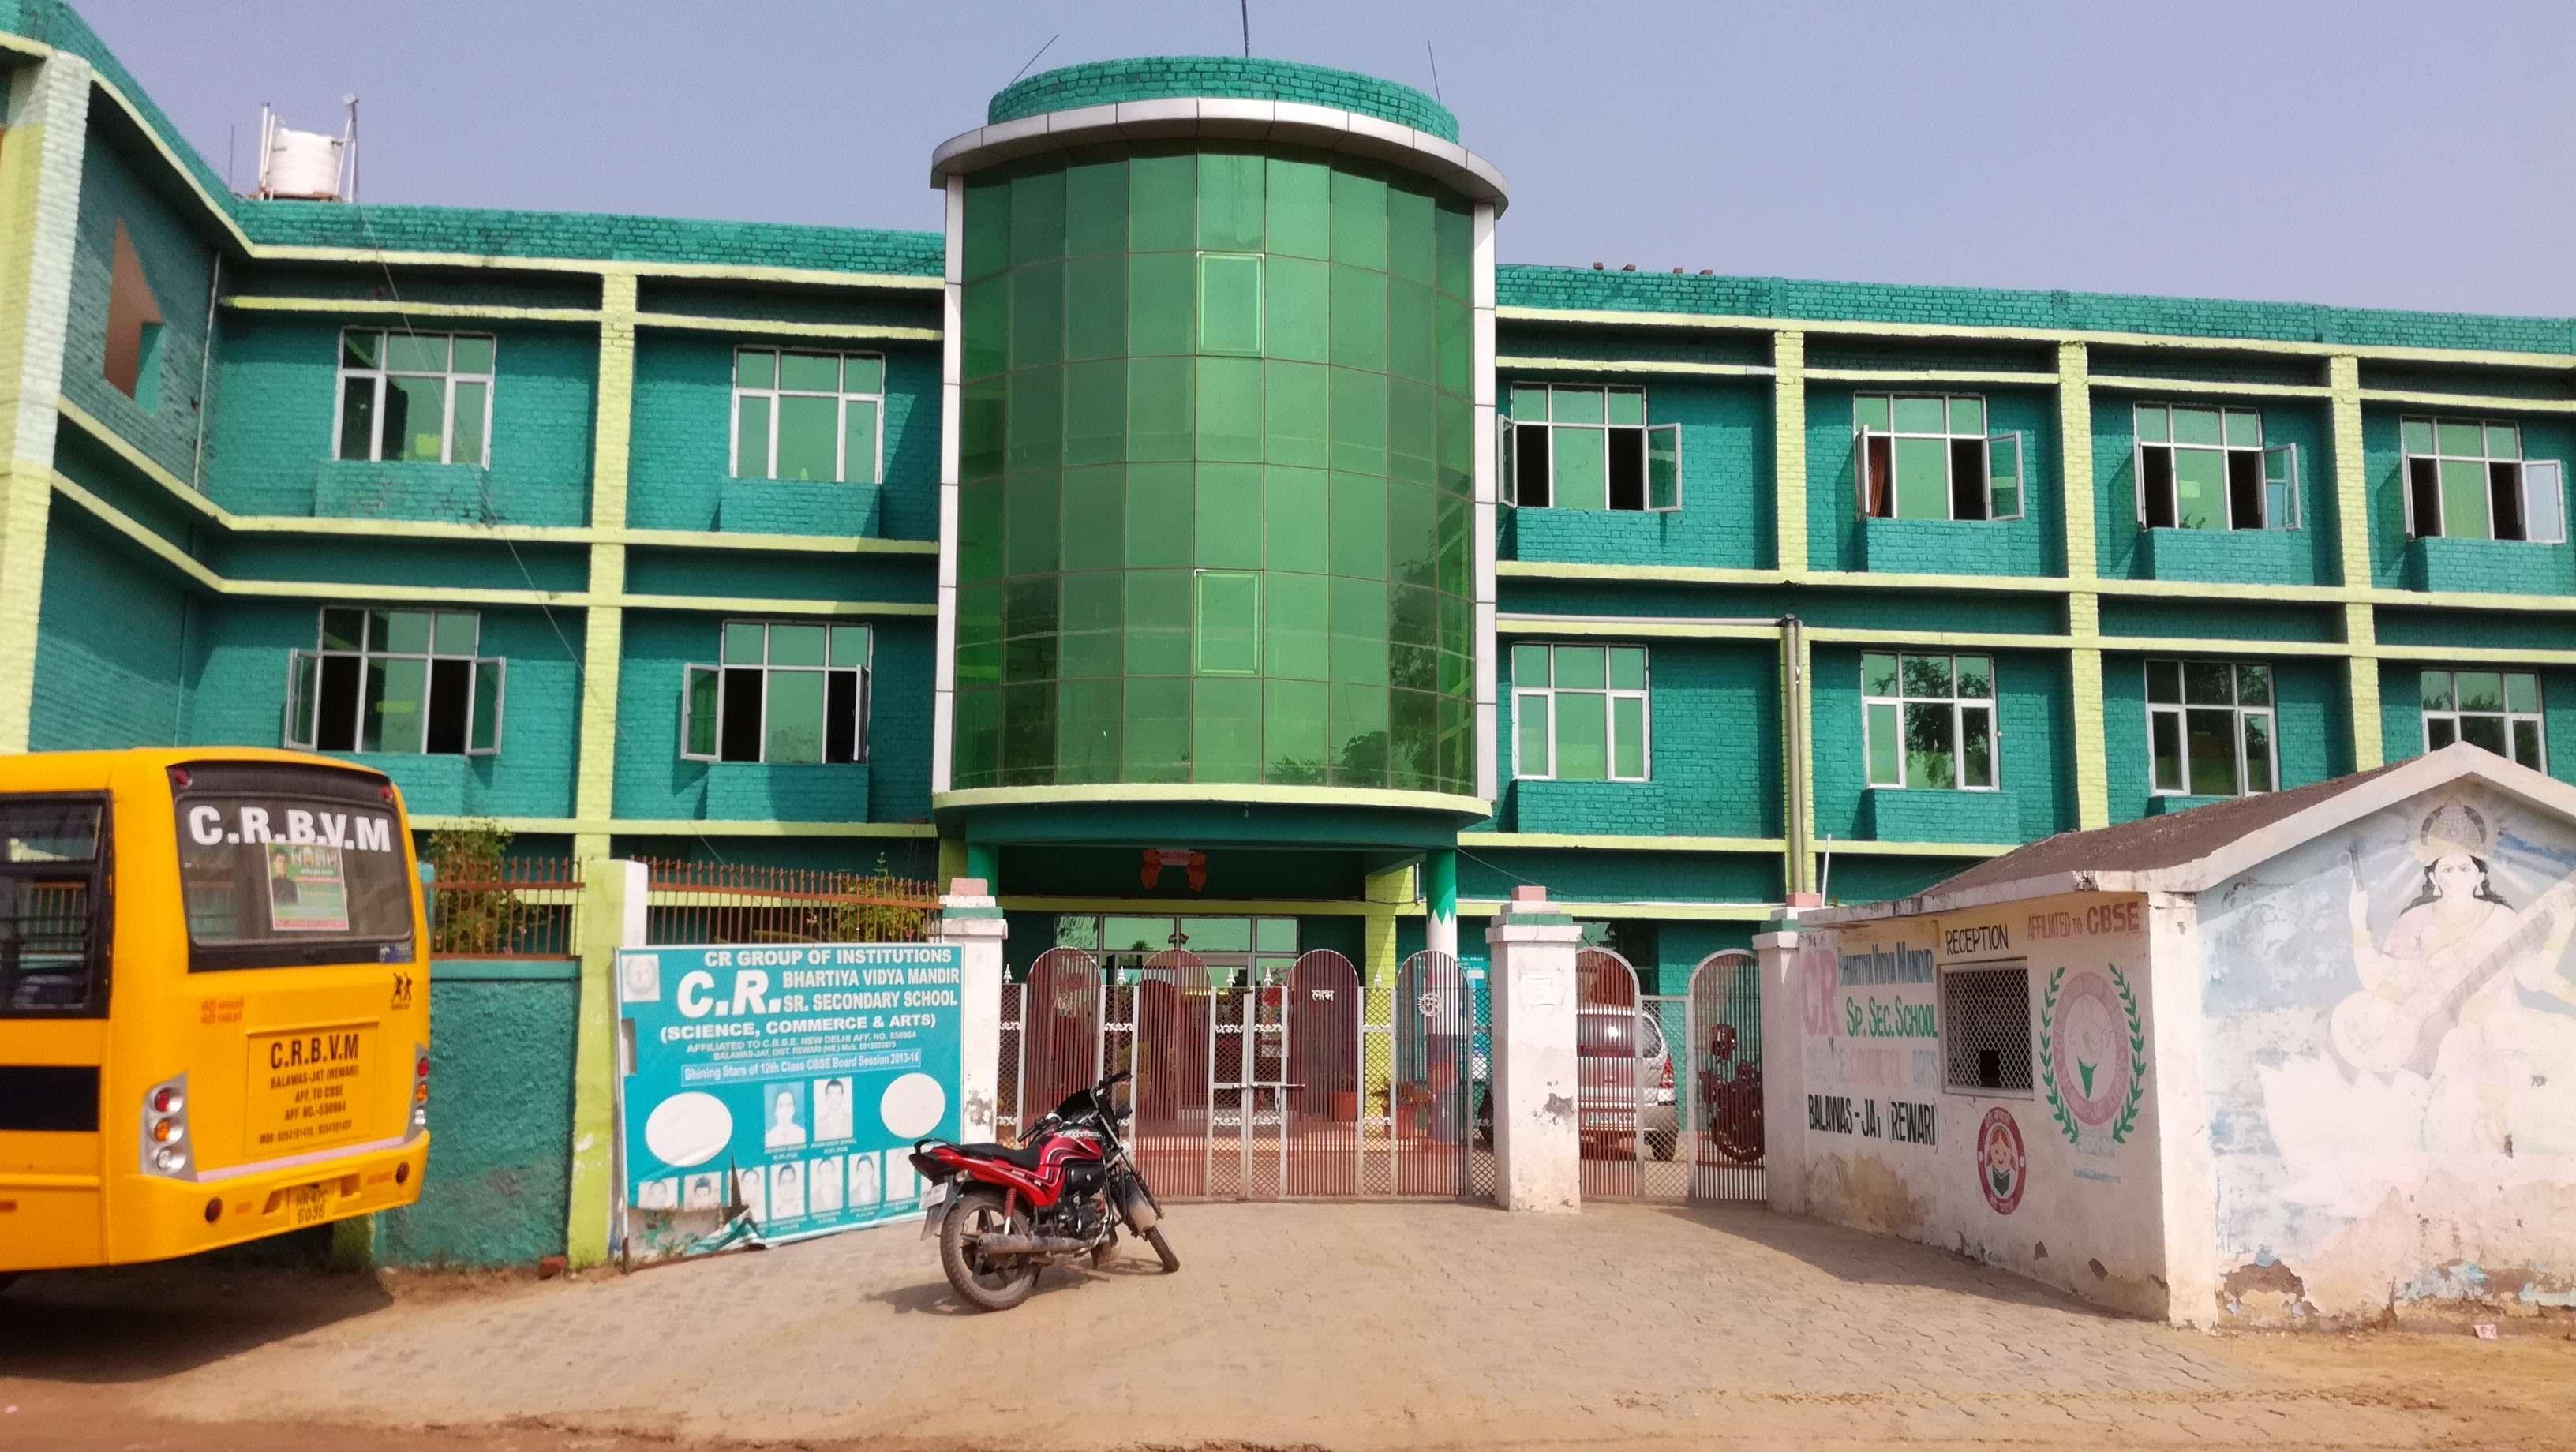 C R Bhartiya Vidya Mandir Sr Sec School Vill Balawas Jat P O Dharan Teh Bawal Distt Rewari Haryana 530964